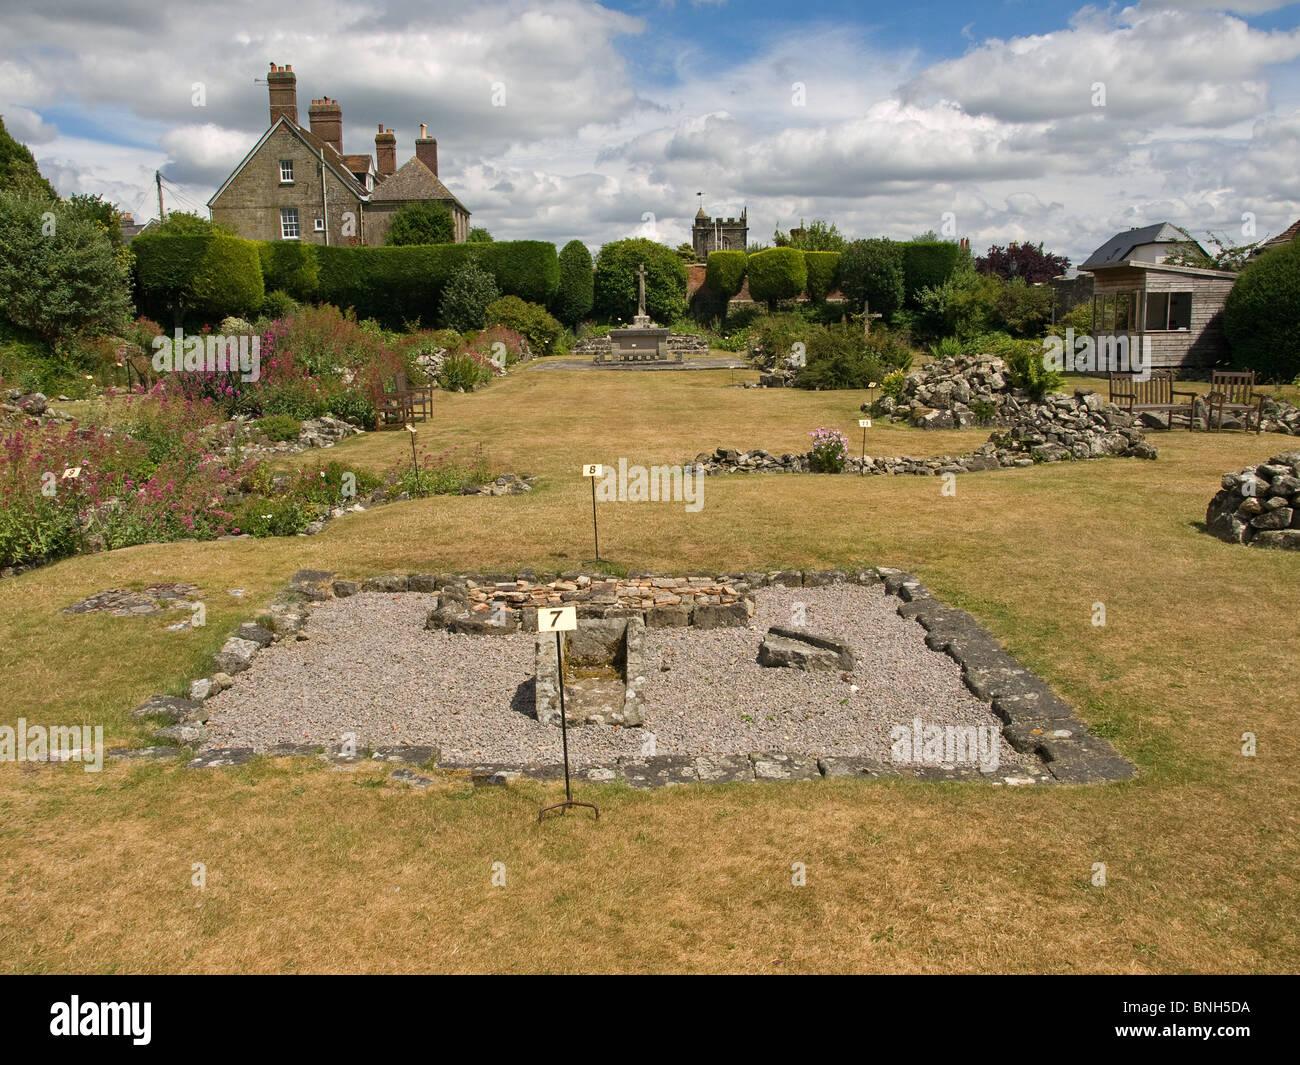 Ruins of Shaftesbury Abbey Dorset England UK - Stock Image